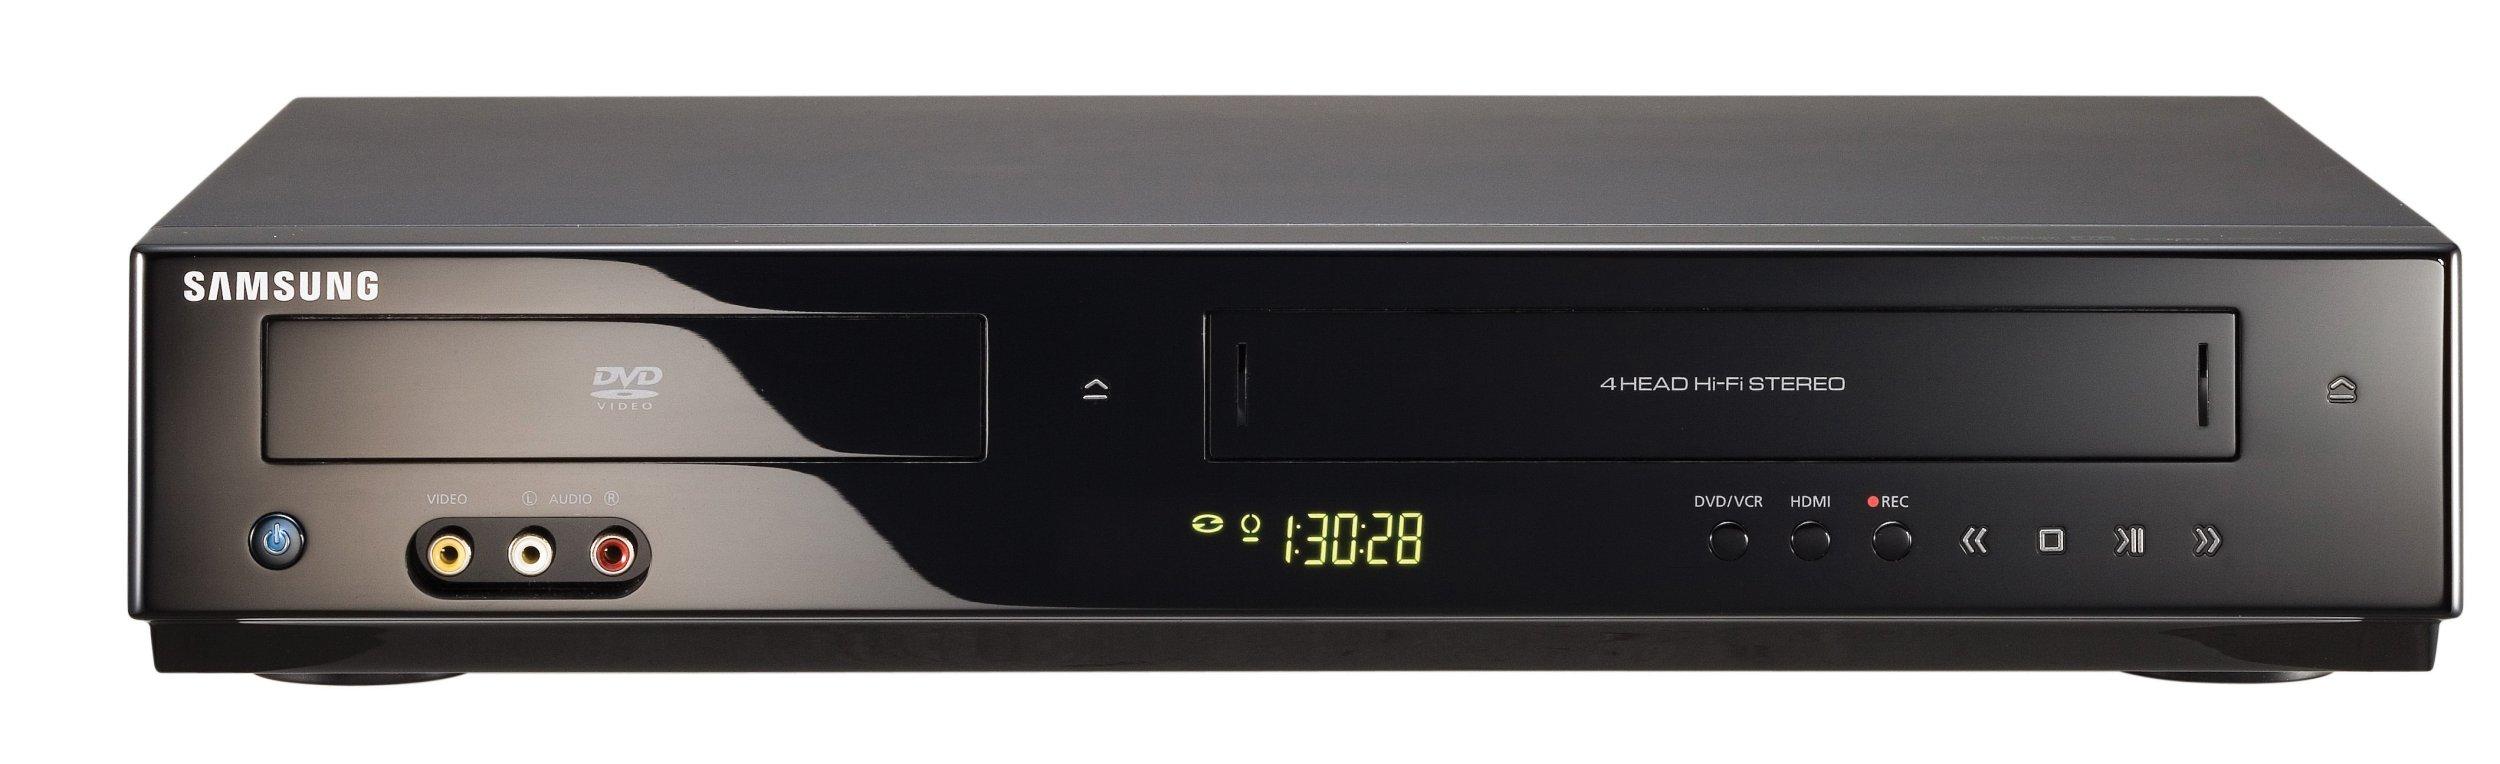 Samsung DVD-V9800 Tunerless 1080p Upconverting VHS Combo DVD Player (2009 Model) by Samsung